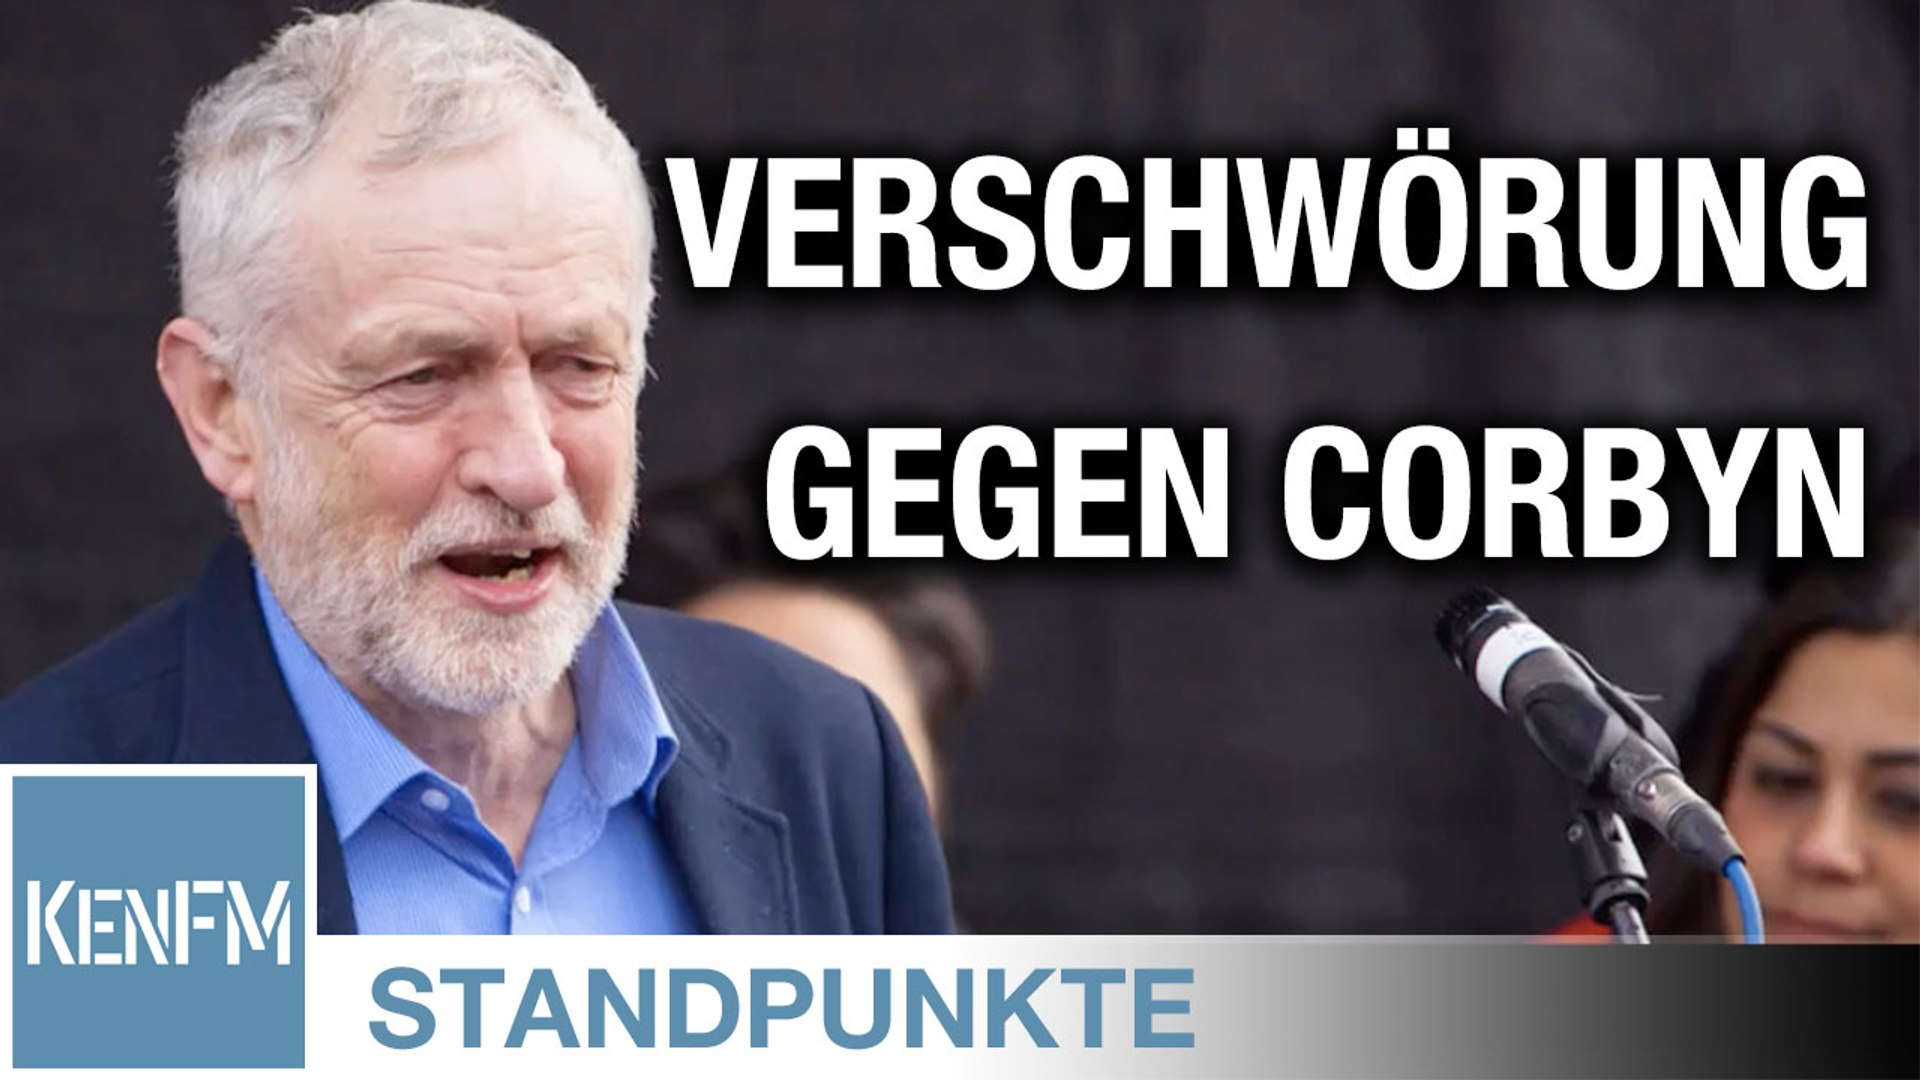 Verschwörung gegen Corbyn | Von Ulrich Teusch